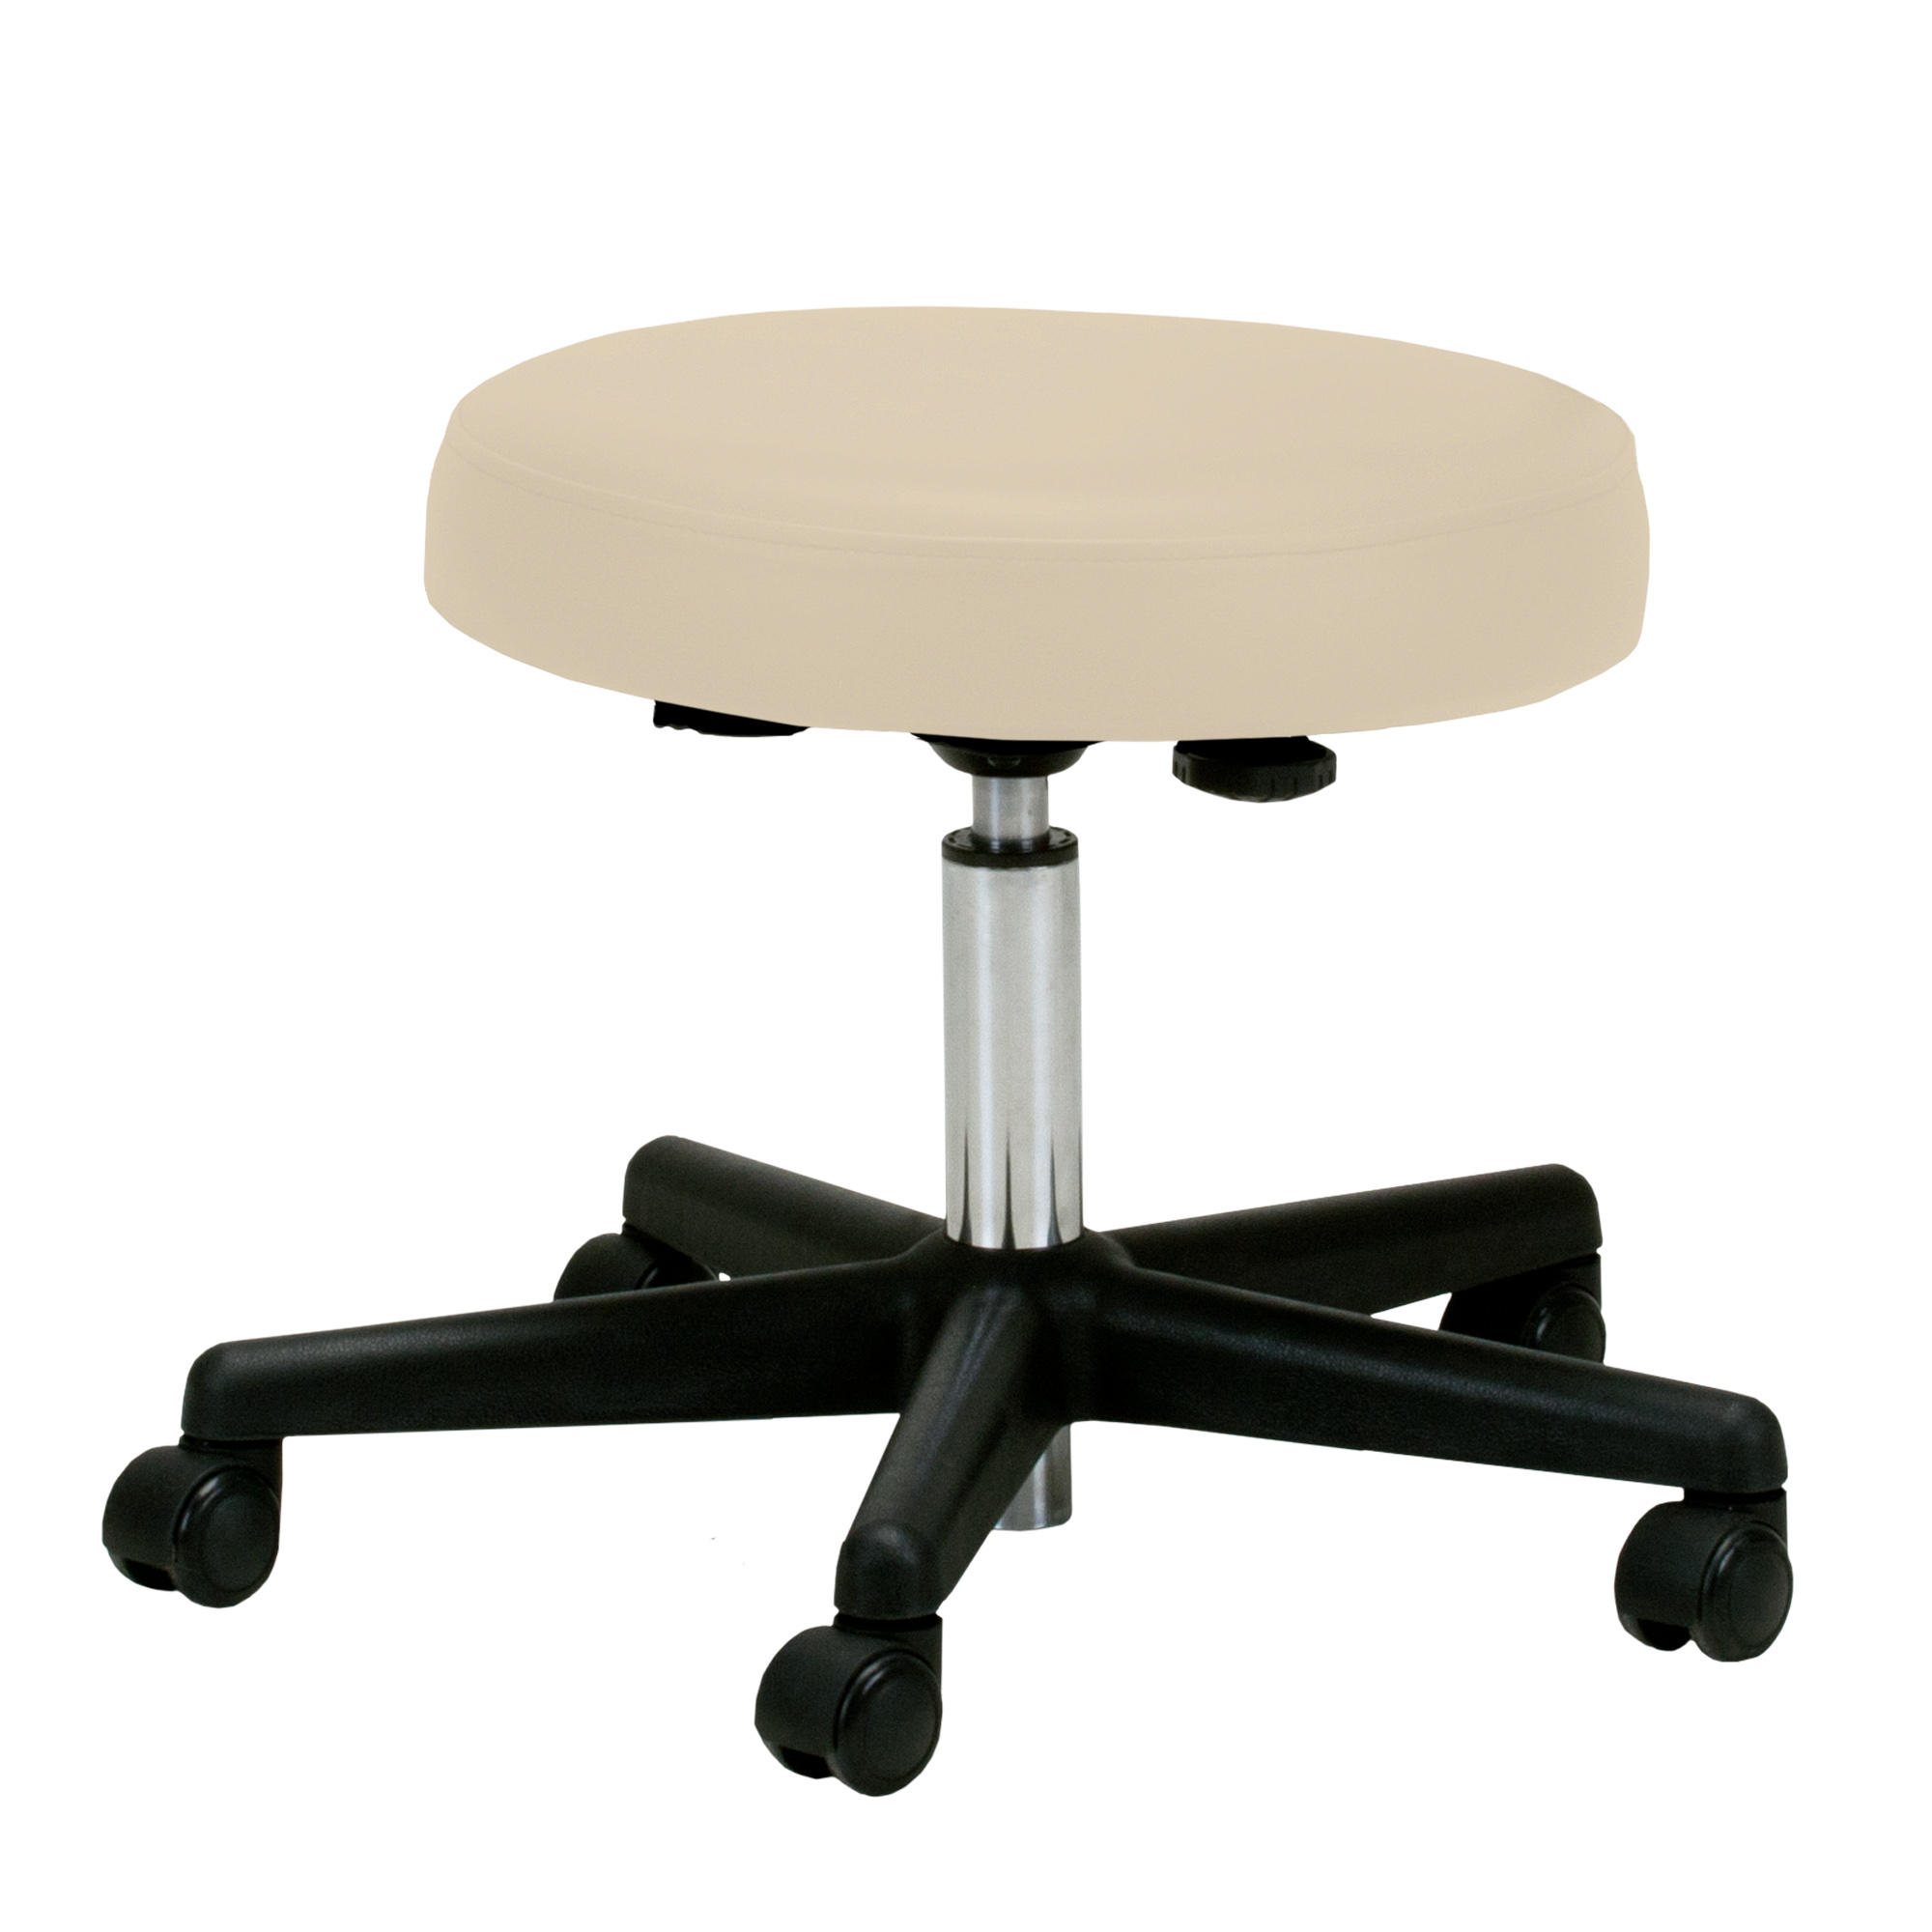 EARTHLITE Pneumatic Massage Therapist Stool - Adjustable ...